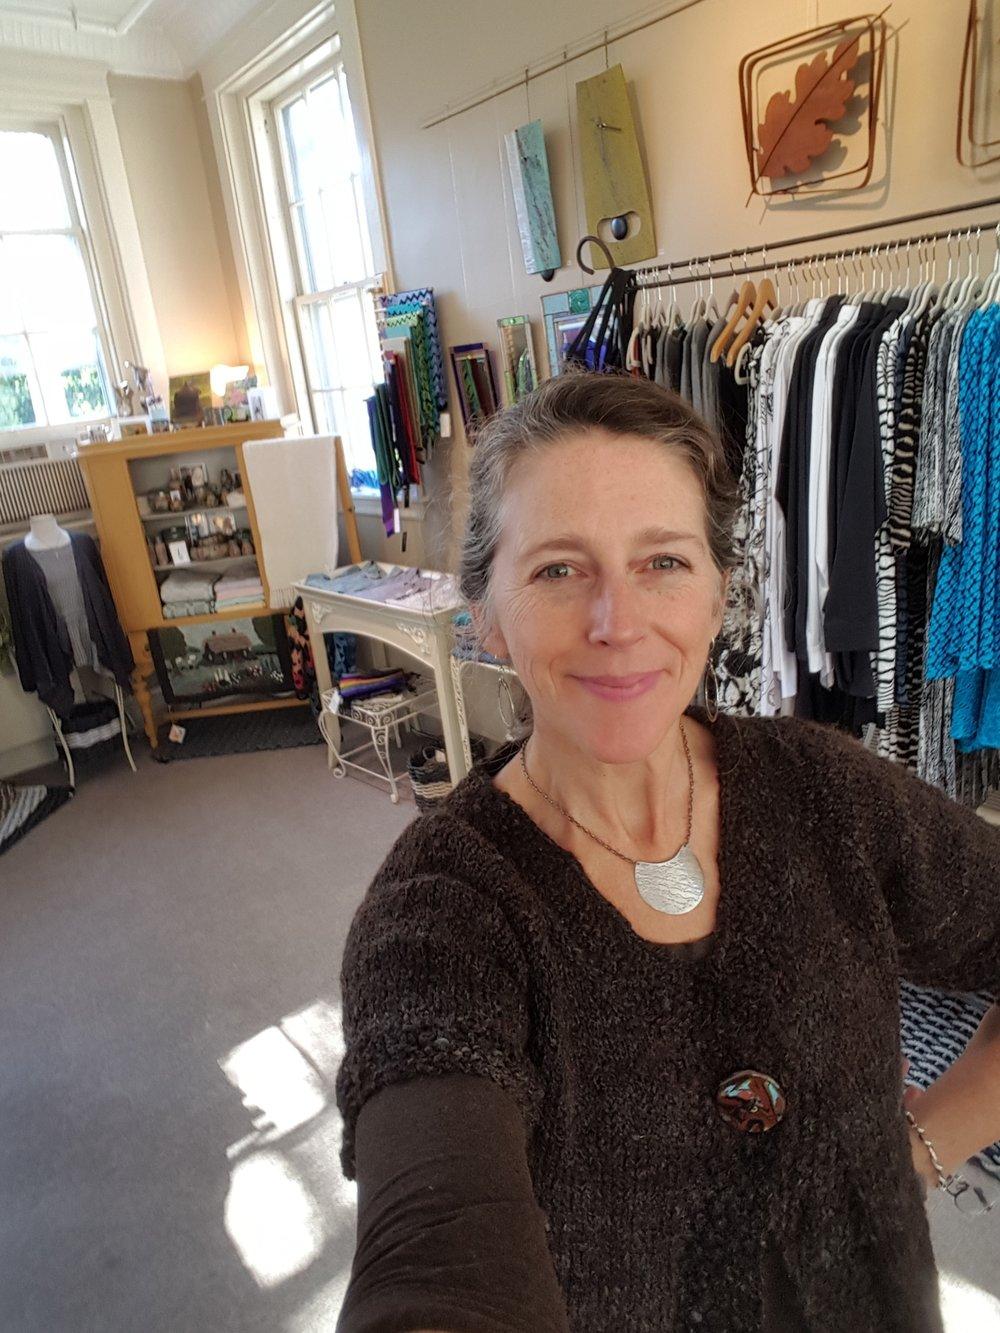 Jodi clayton, owner & designer